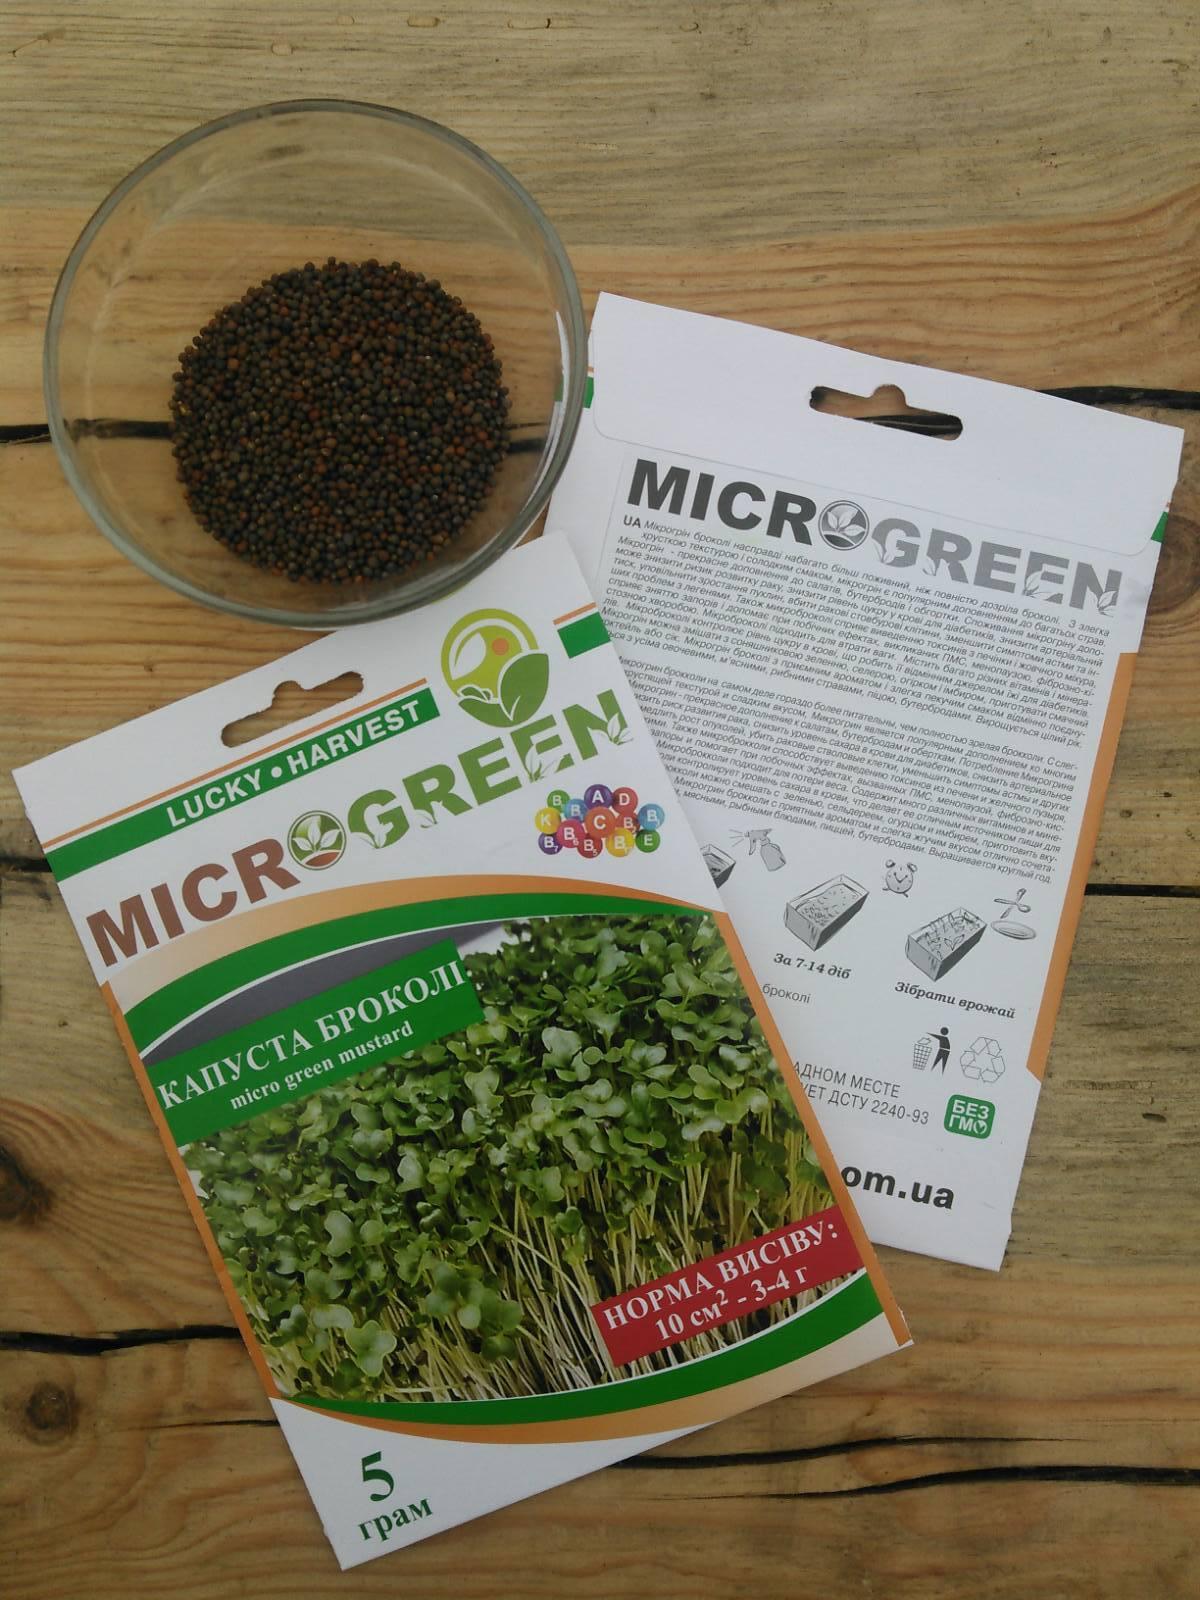 Семена Микрозелени Капуста Брокколи, 5 г.  LUCKY HARVEST (Украина)